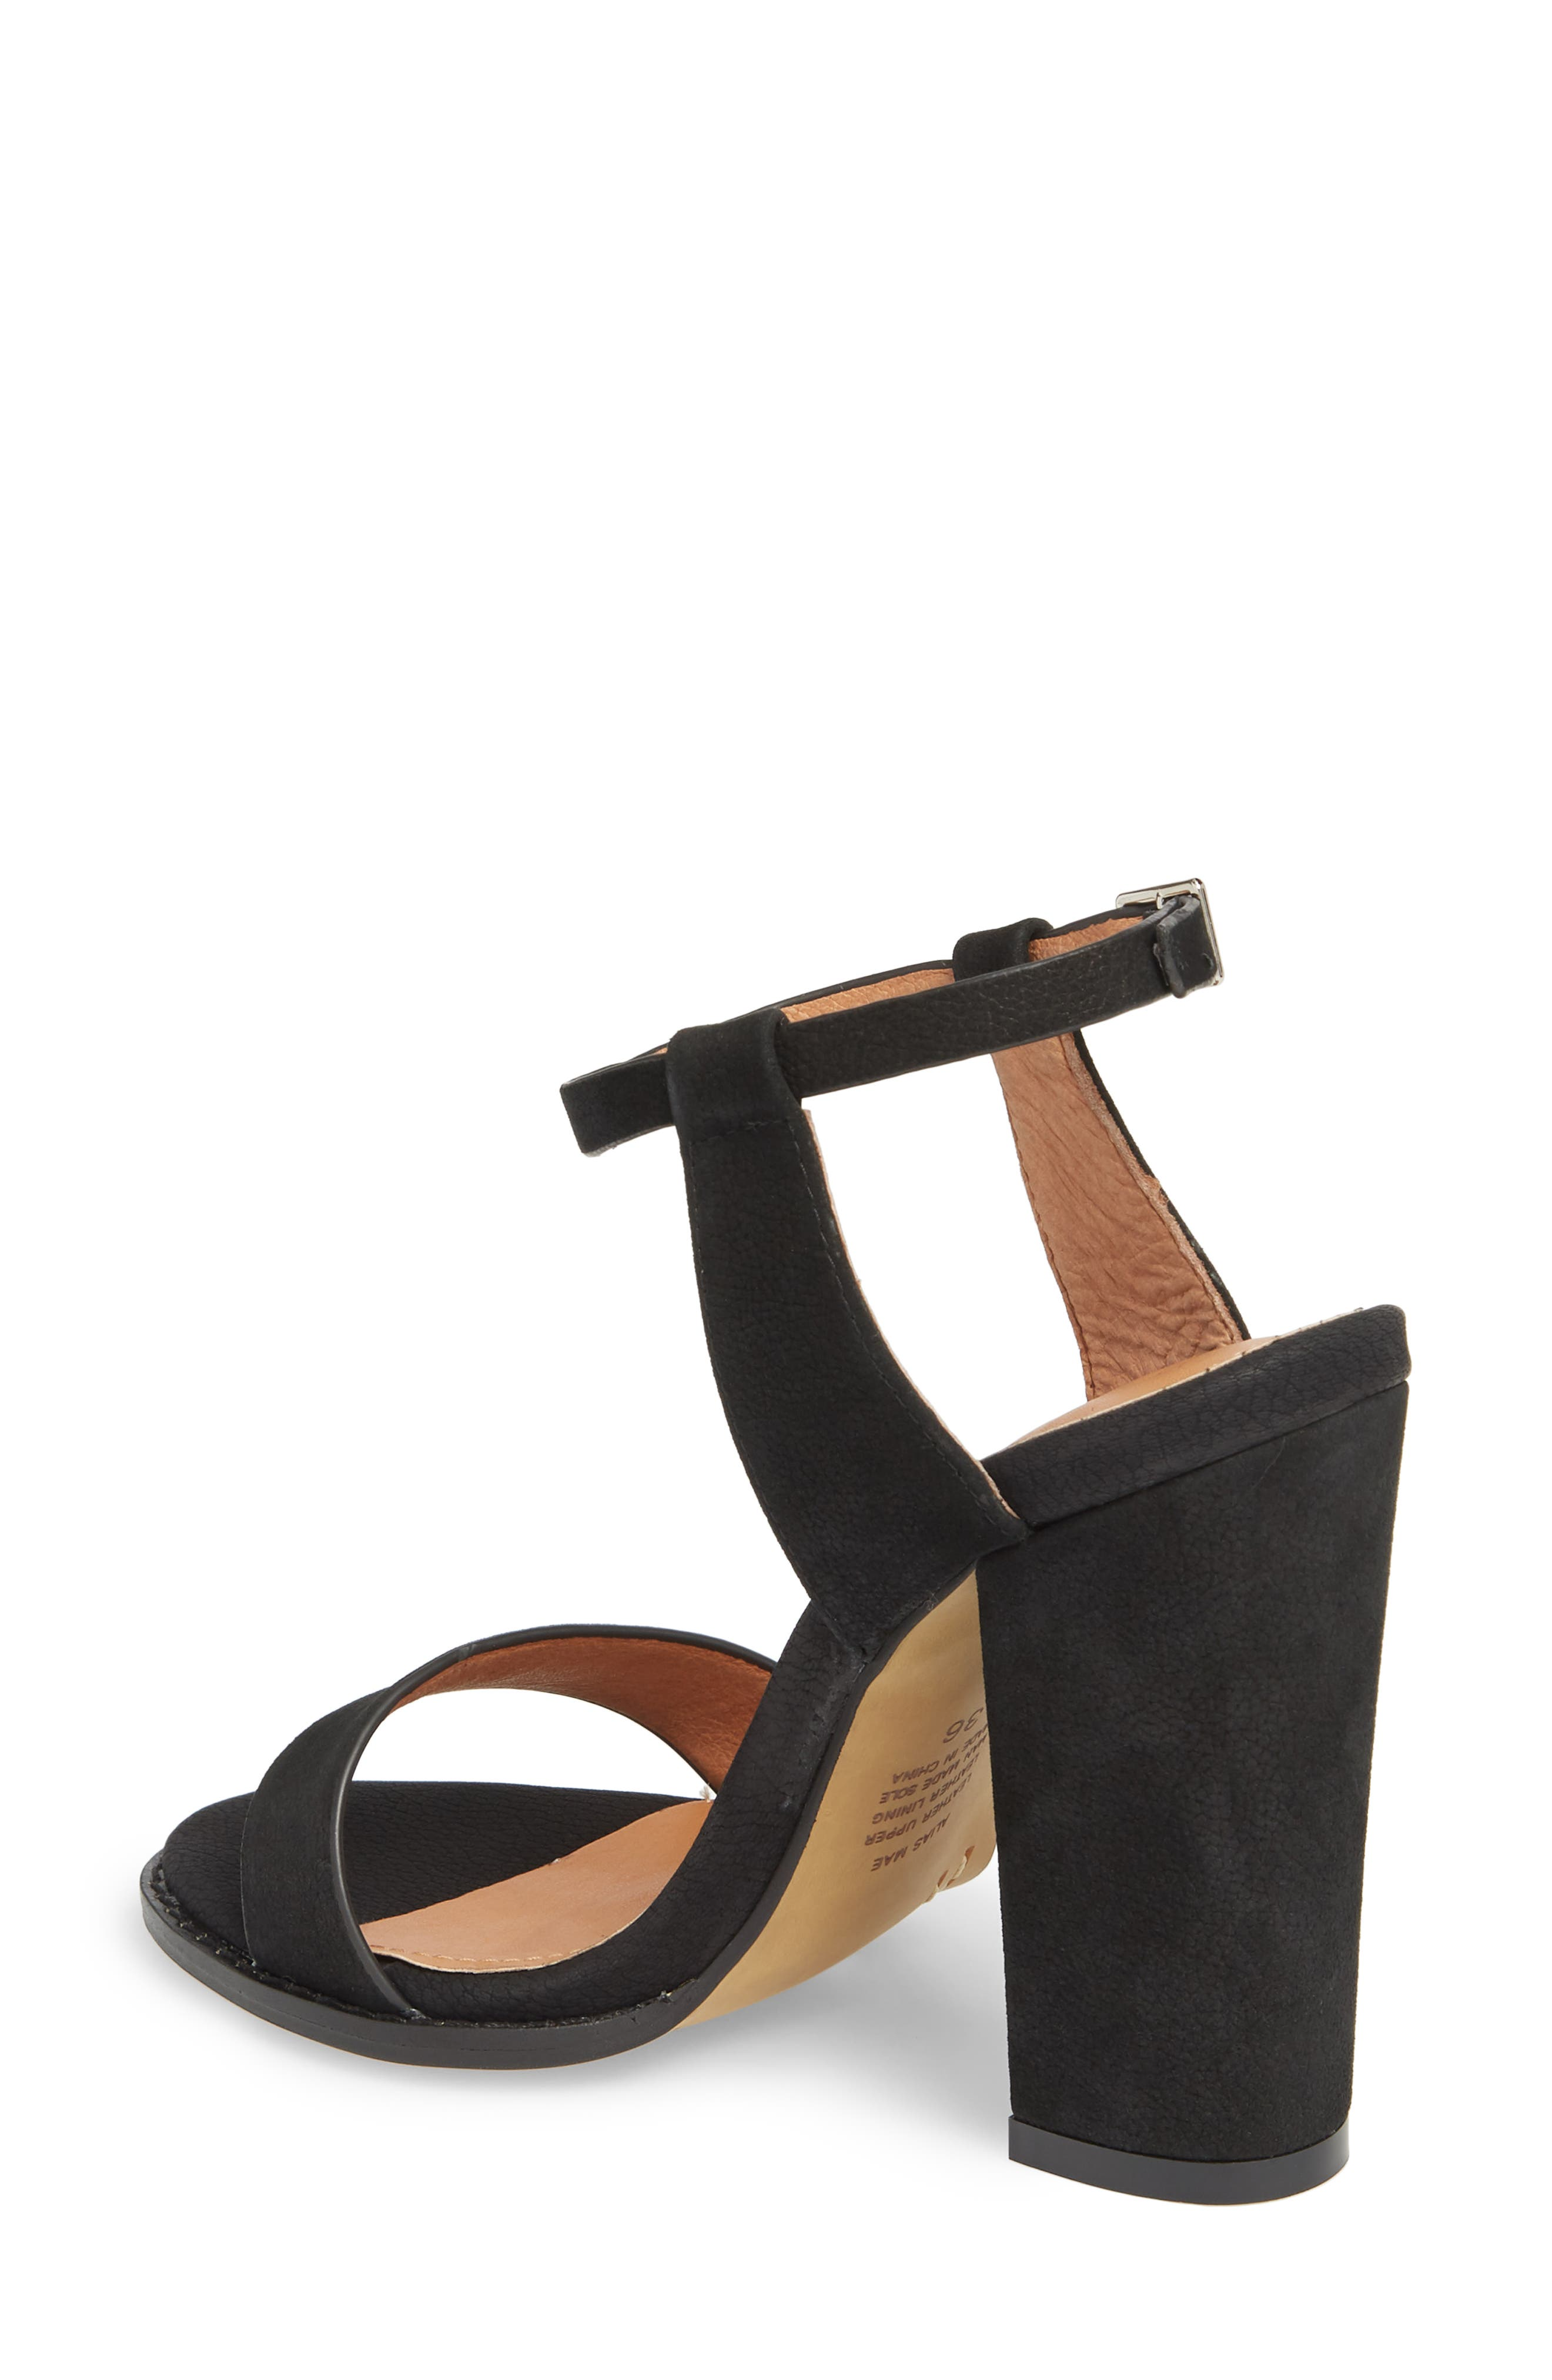 Jynk Sandal,                             Alternate thumbnail 2, color,                             Black Leather